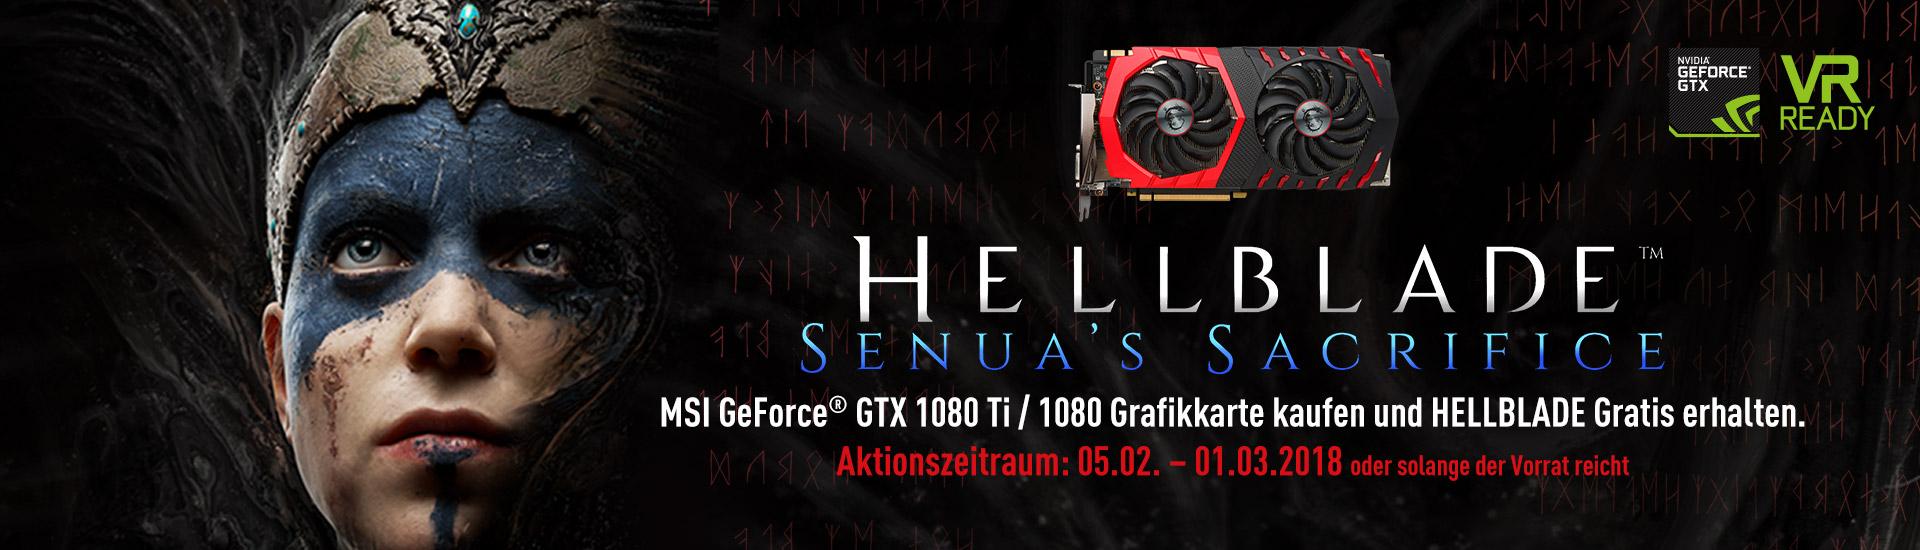 1080 VGA Hellblade Bundle